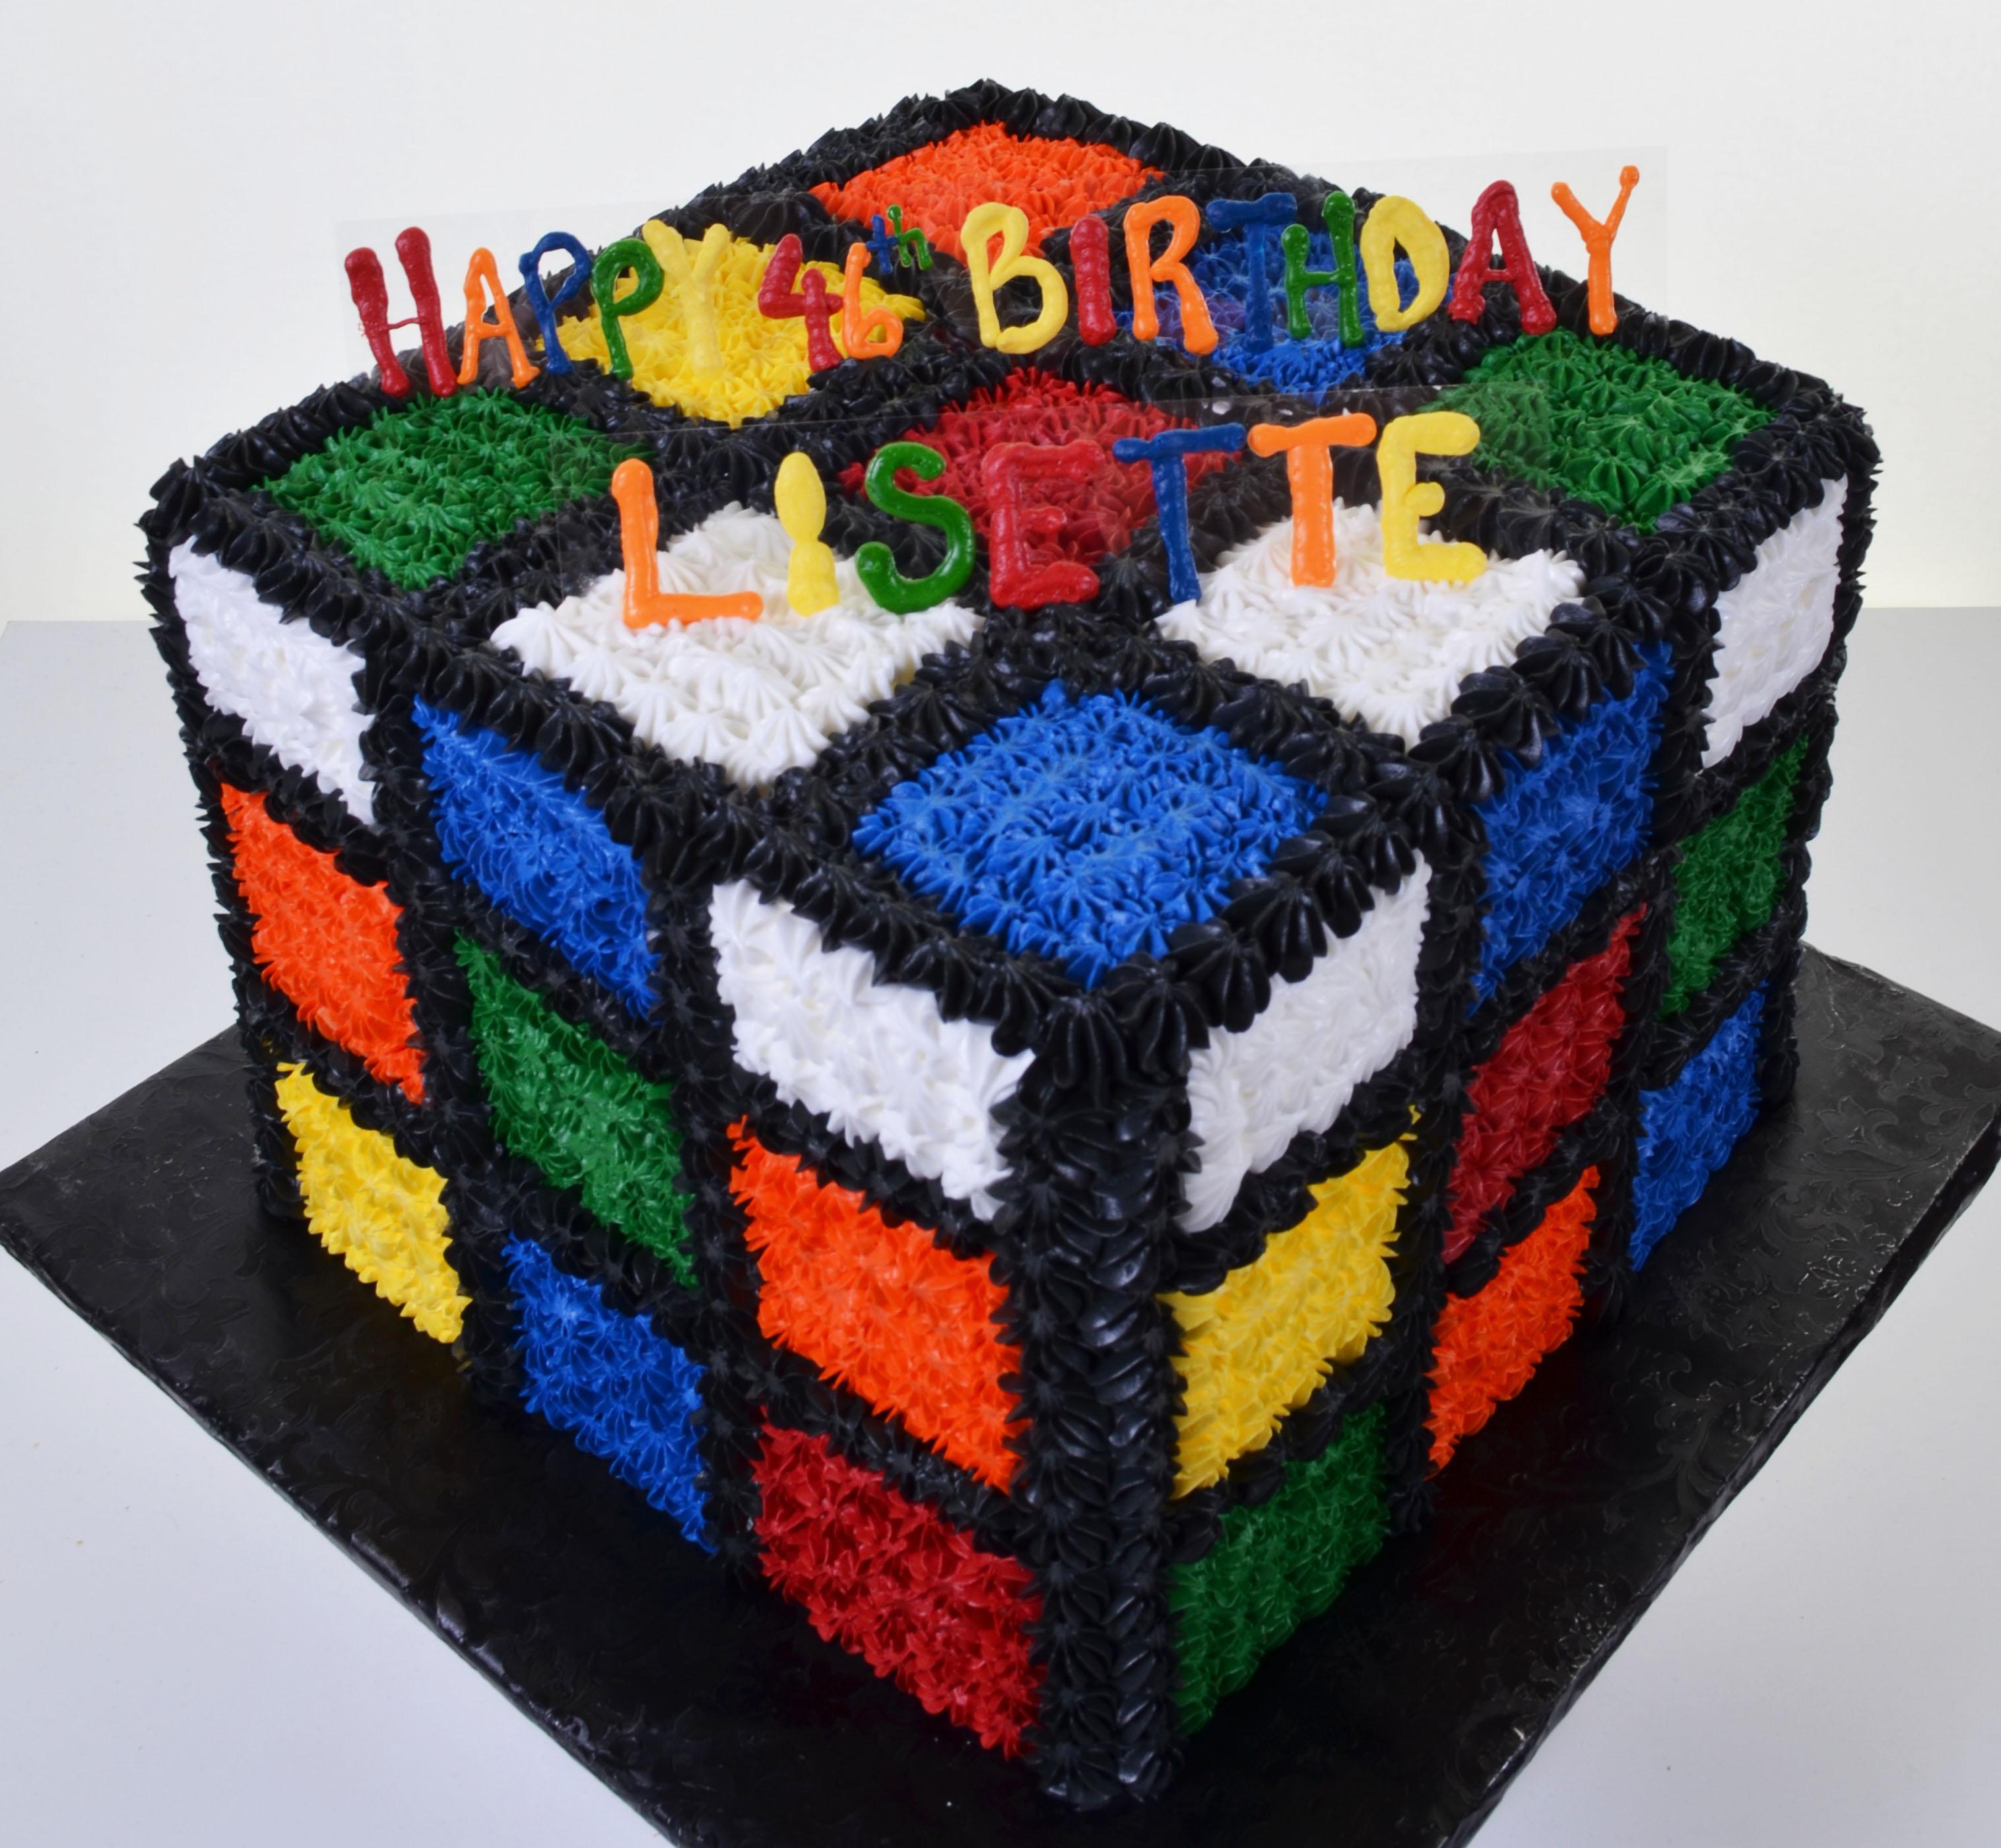 Cube World Chocolate Cake